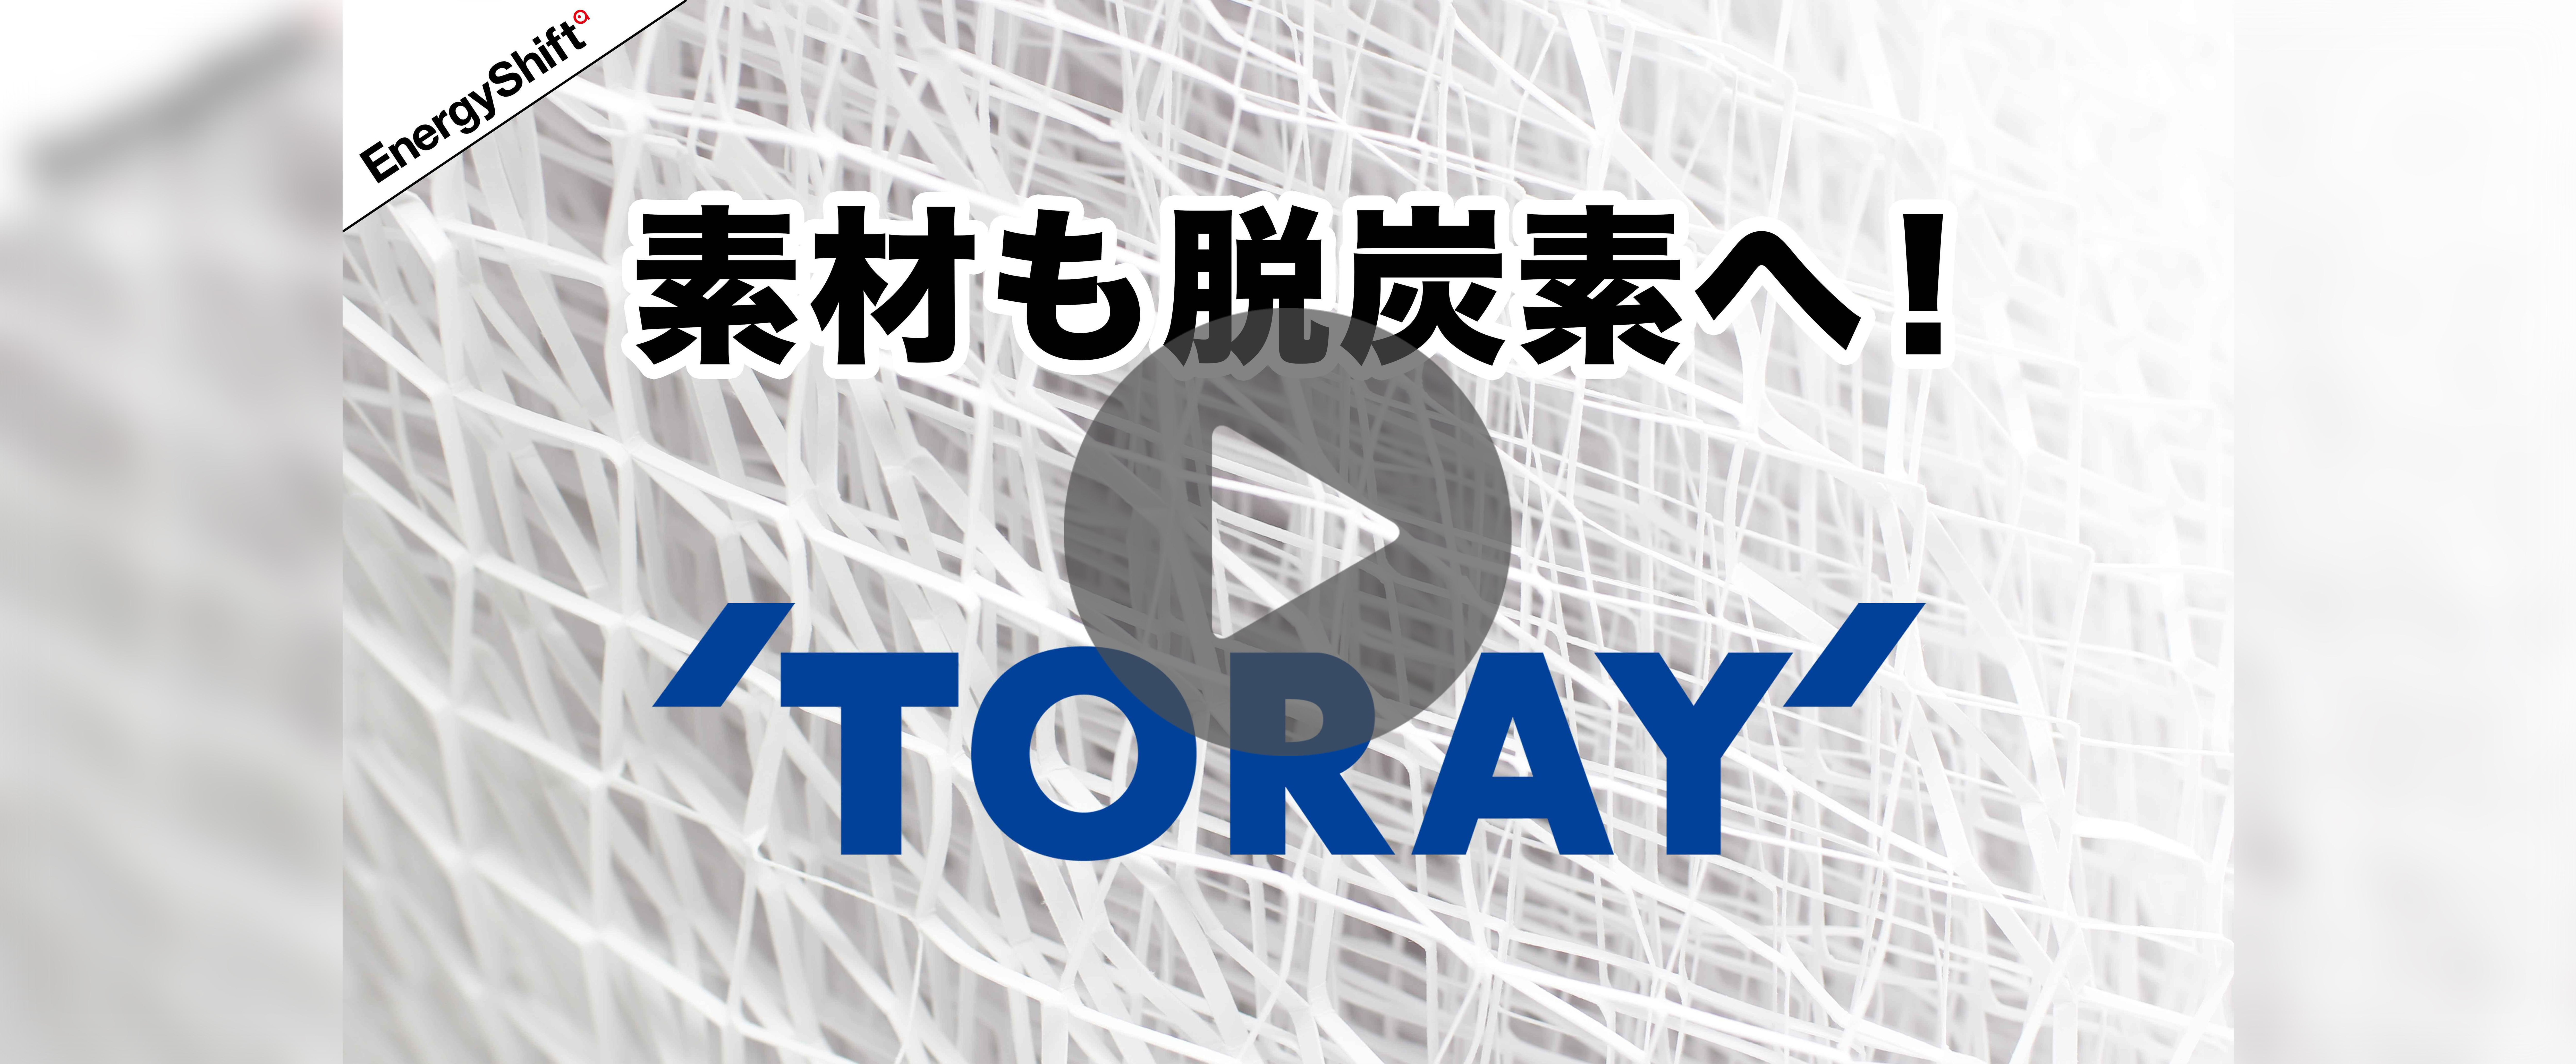 【YouTube】東レ 実は隠れた再エネ・水素による脱炭素会社